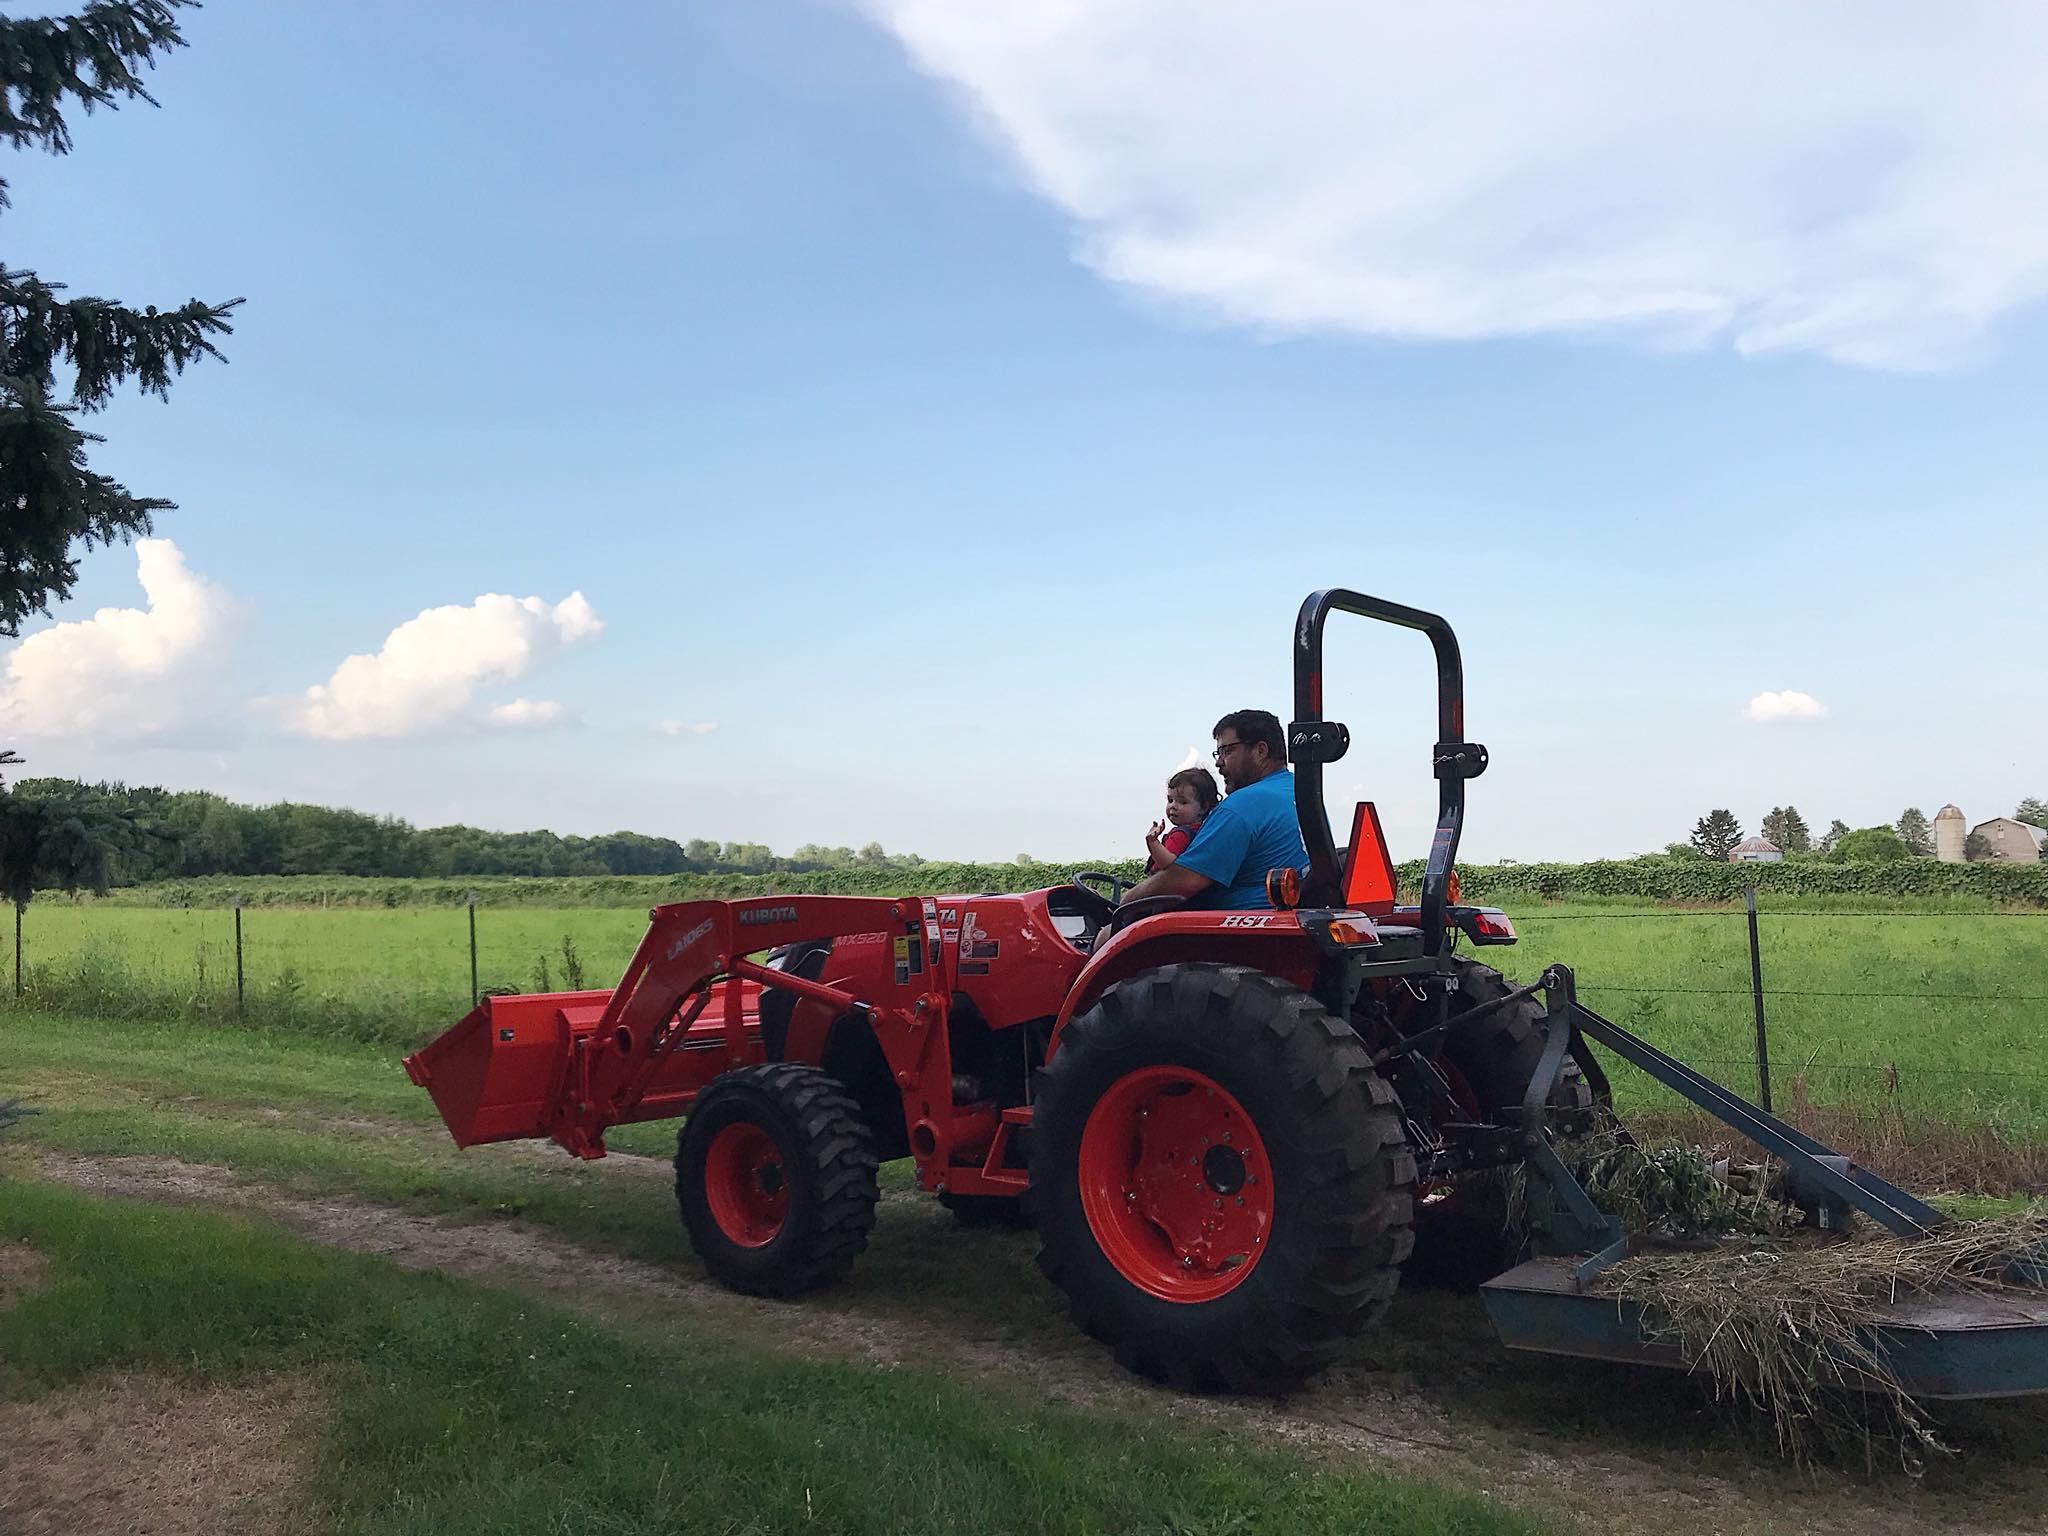 Taking a ride on Poppy Webb's new tractor, July 2018